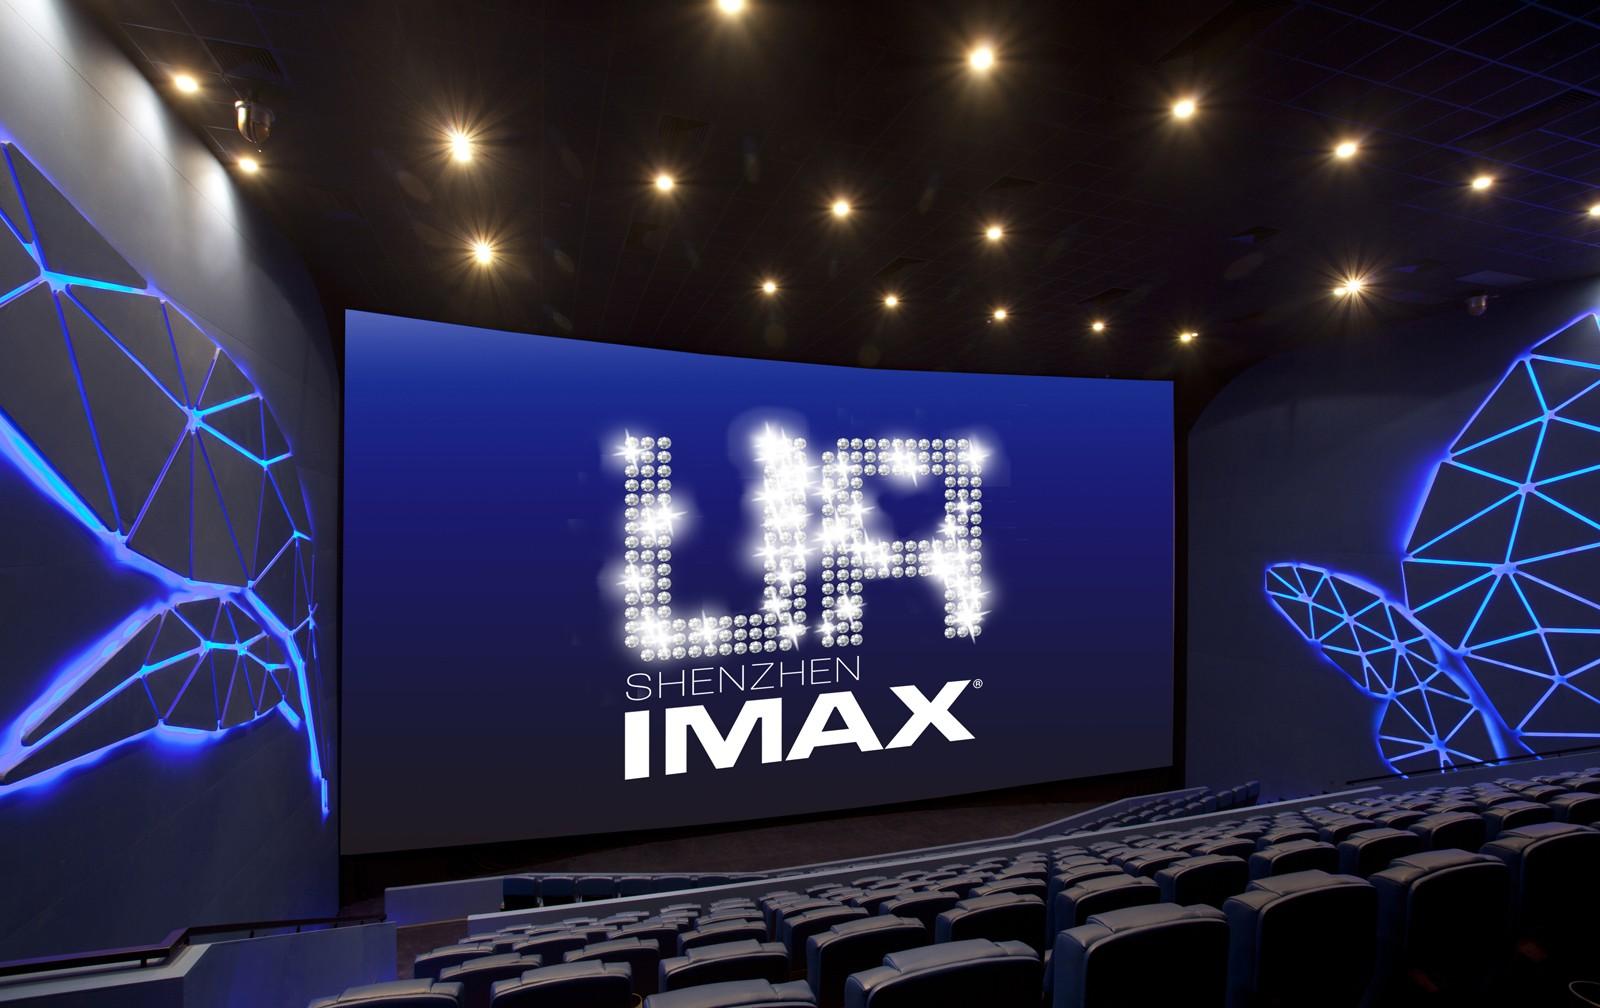 IMAX SHenzhen